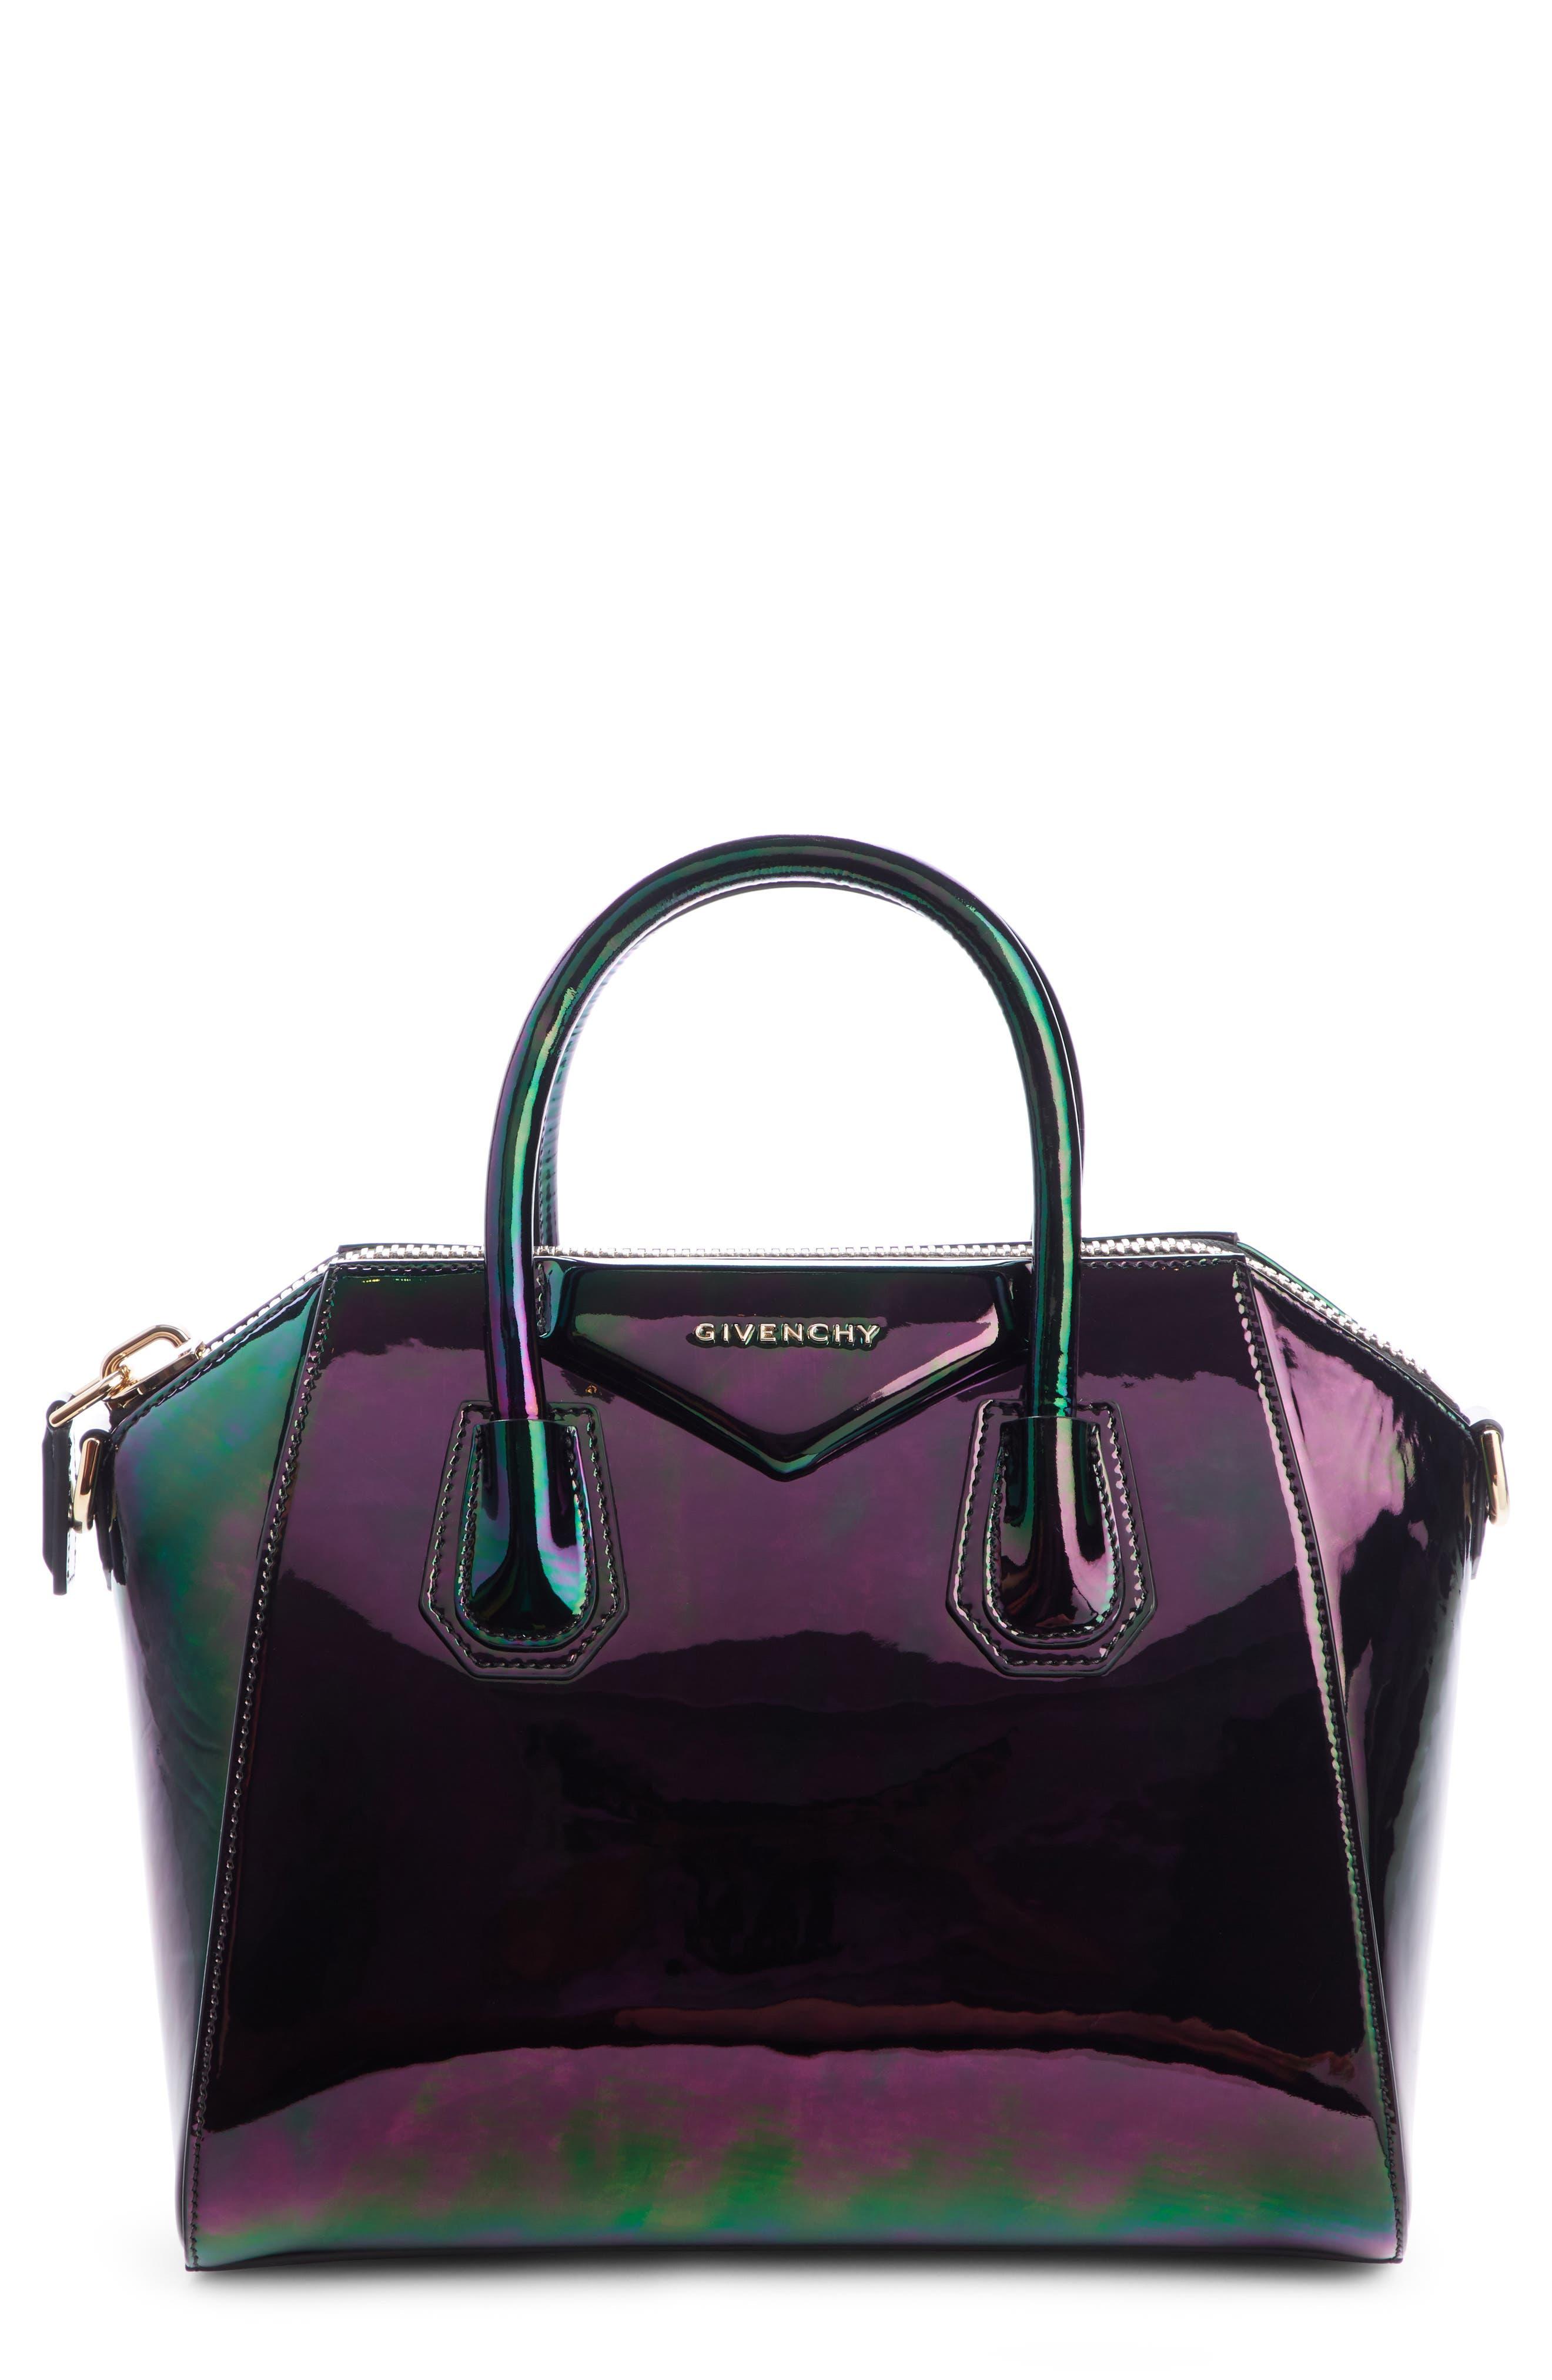 Givenchy HandbagsNordstrom HandbagsNordstrom Women's Givenchy Women's Givenchy Women's HandbagsNordstrom 5jqcR4LS3A